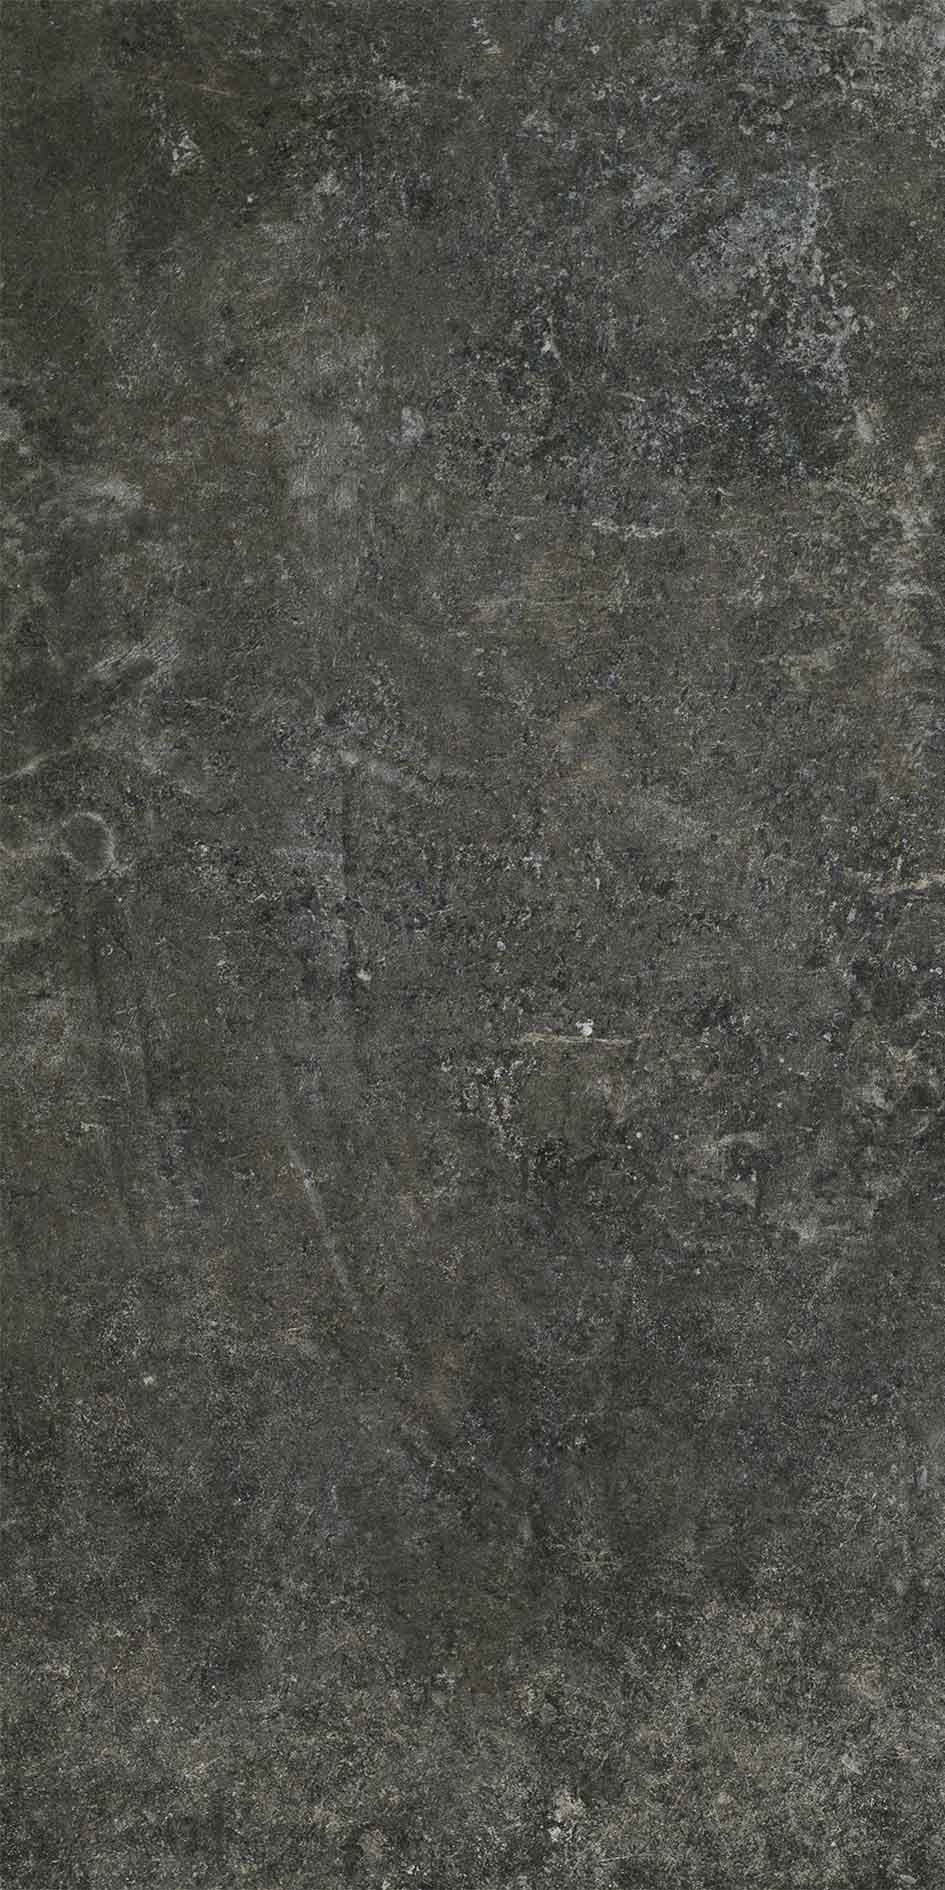 Artifact Worked Charcoal Matte 10mm 40 x 80